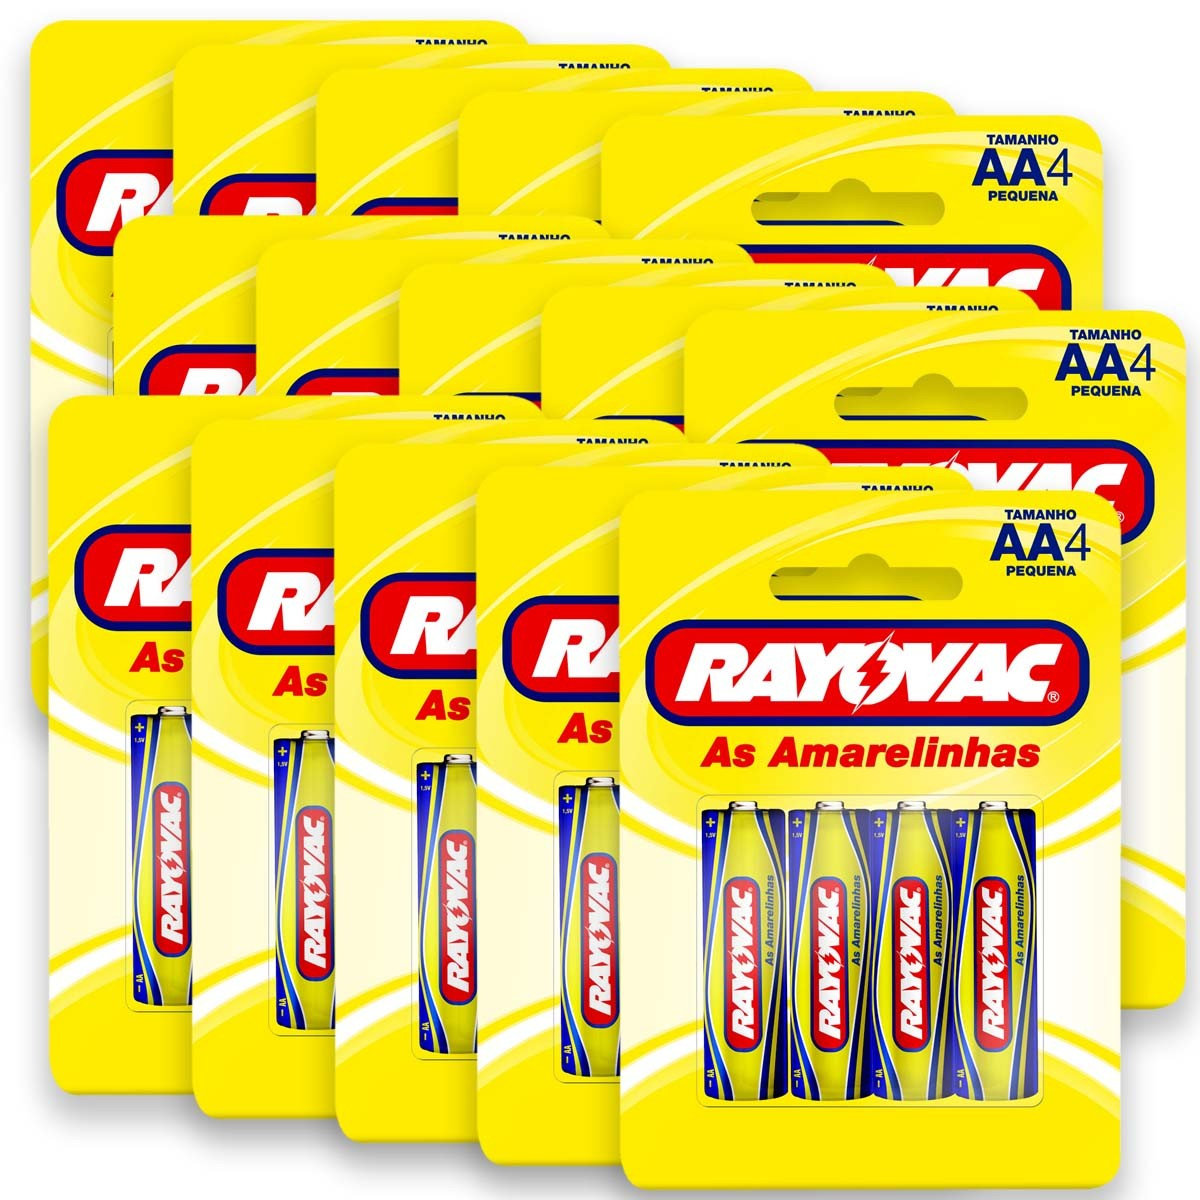 60 Pilhas AA Zinco Carvão RAYOVAC 15 cartelas